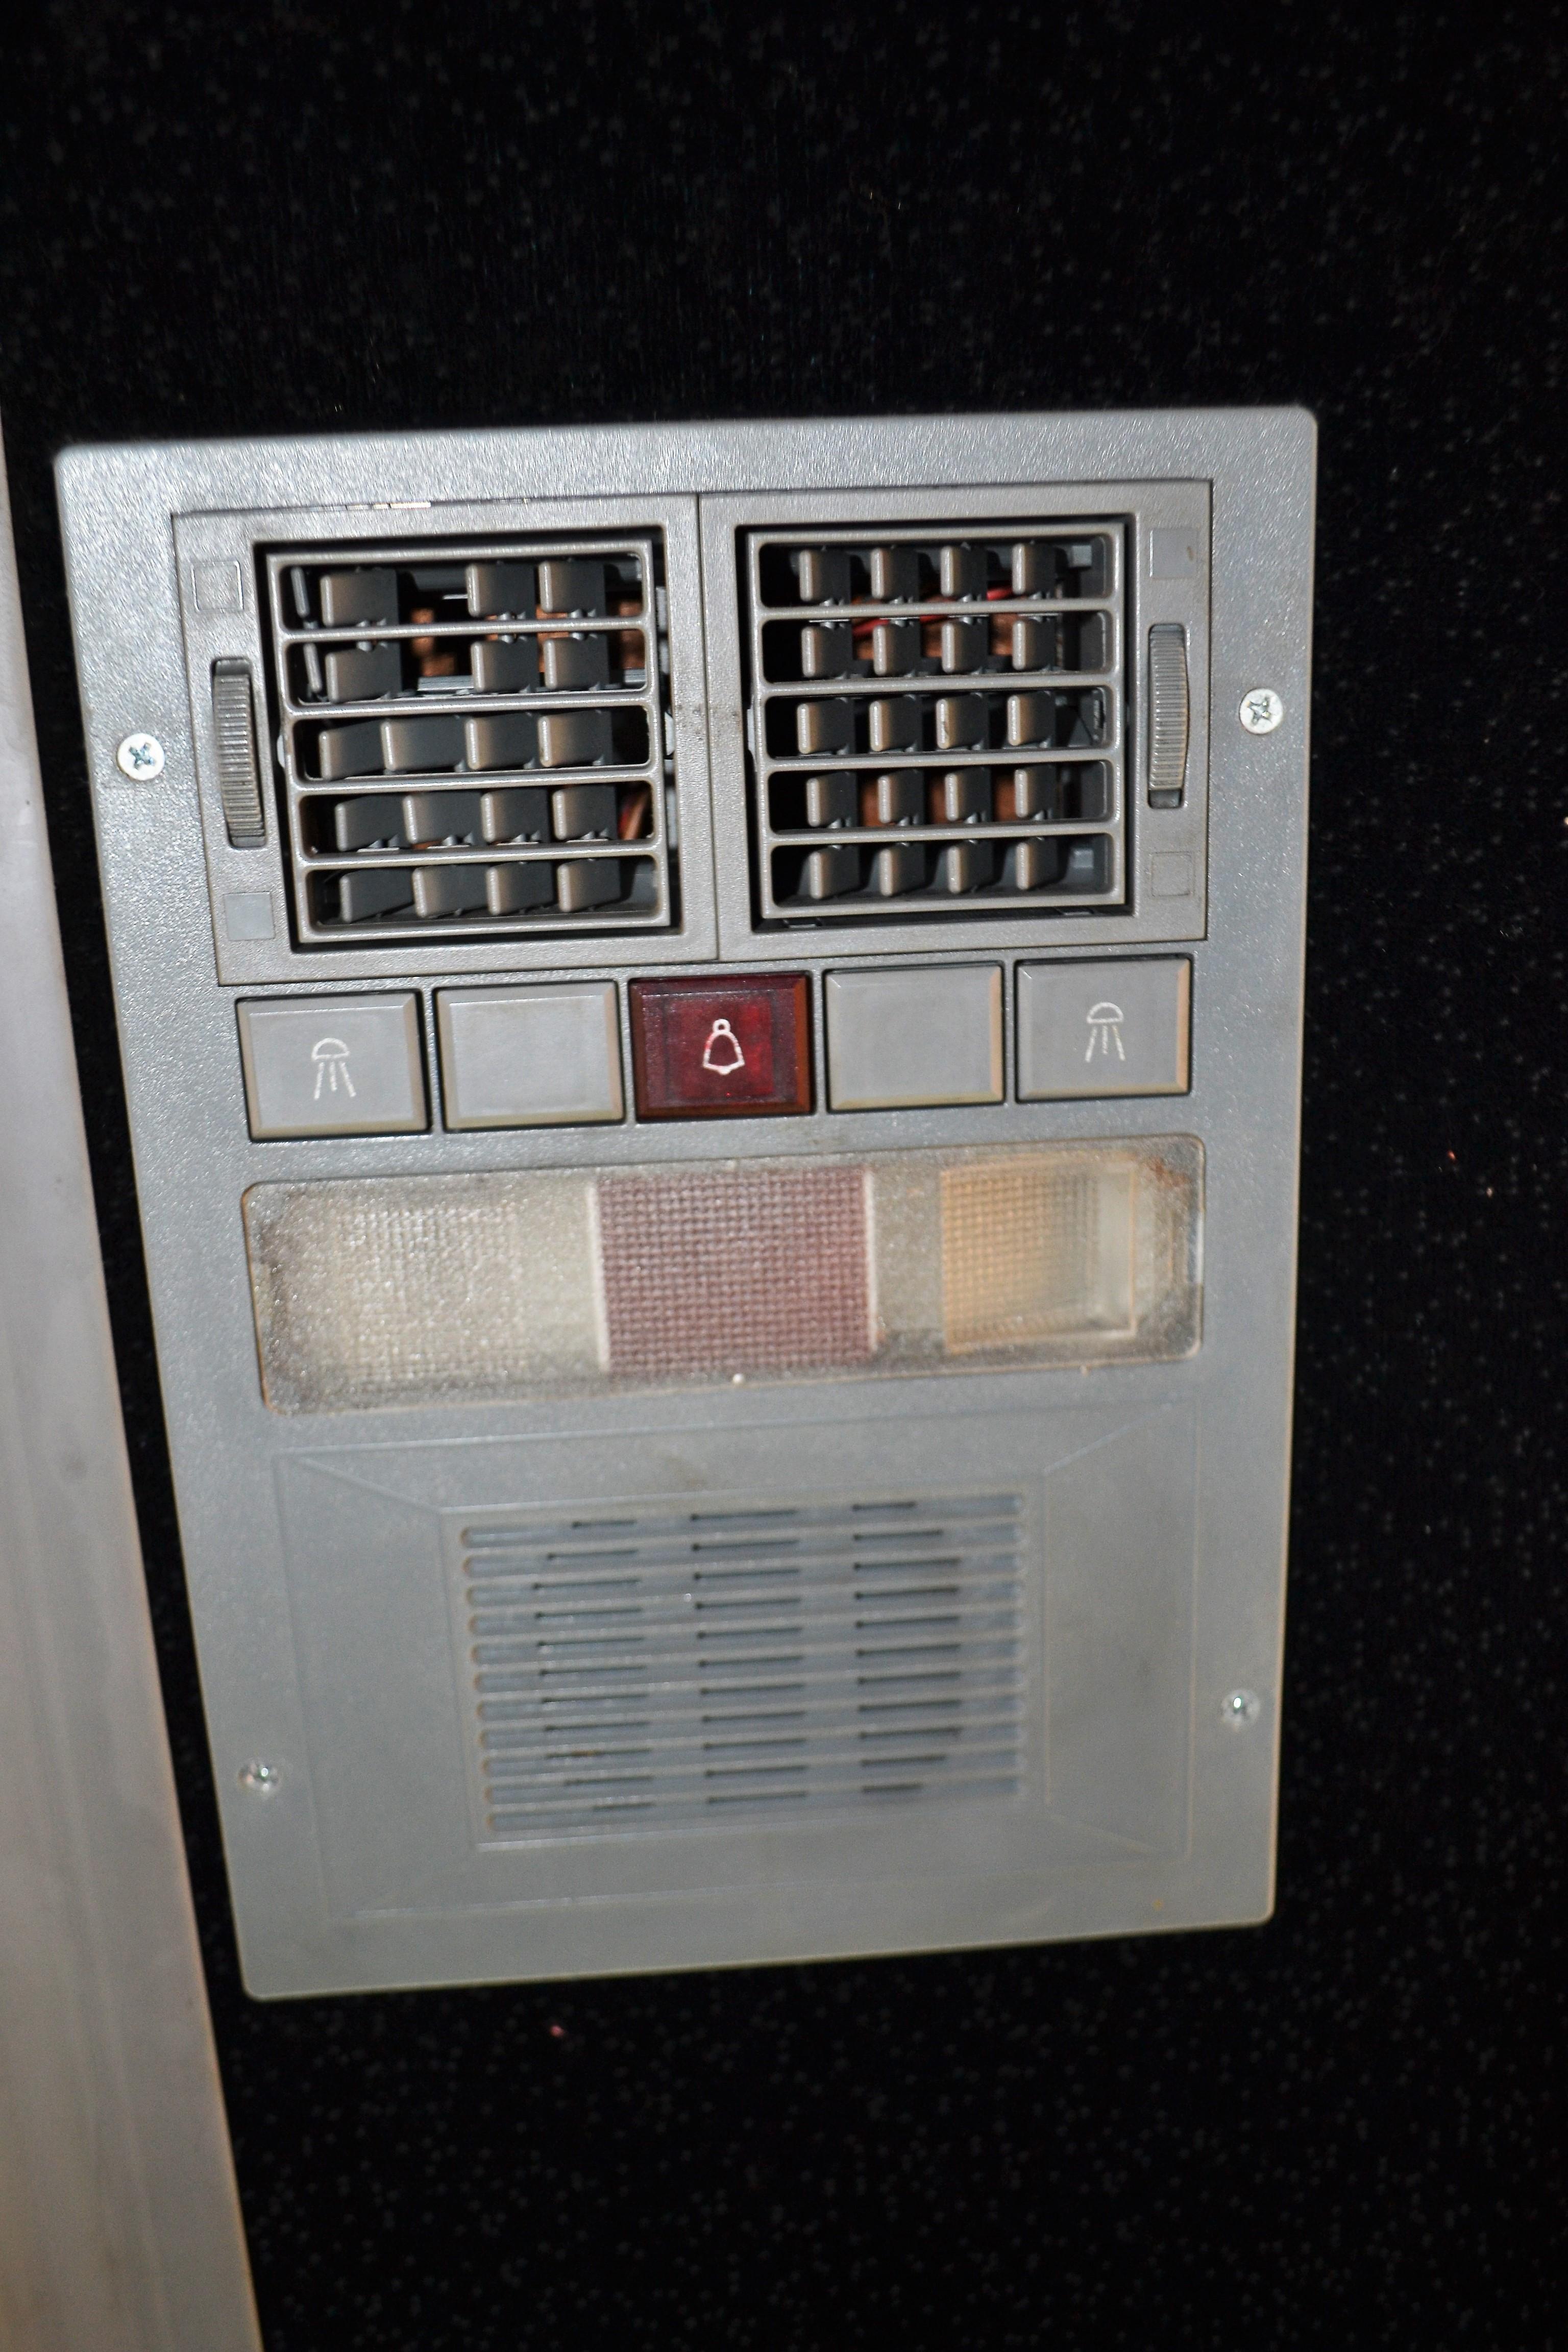 Lot 2 - 2001 Van Hool Commuter Bus # 357 **DOES NOT TURN ON**